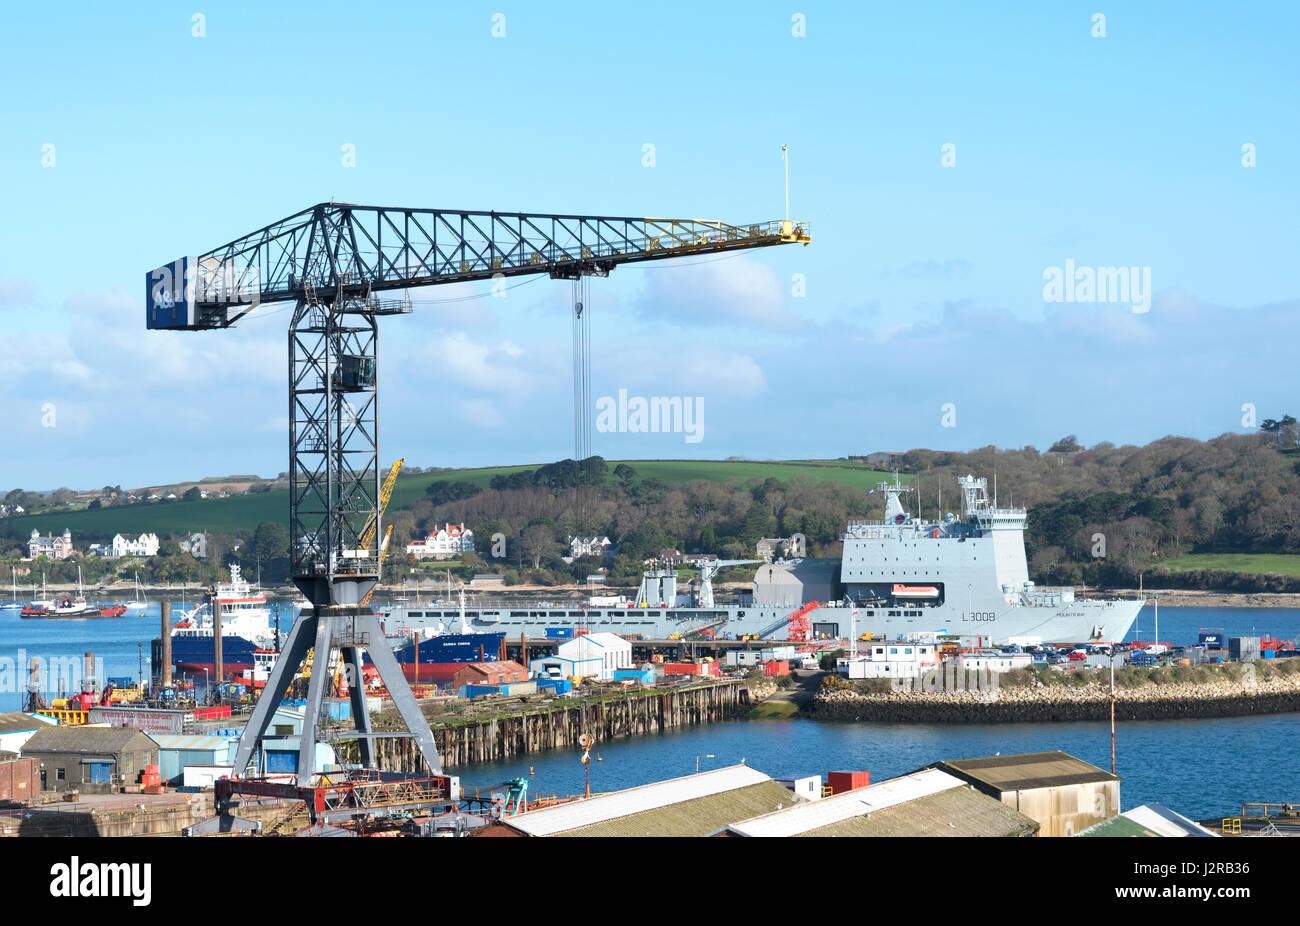 Pendennis shipyard at Falmouth docks in Cornwall, England, Britain, UK. - Stock Image